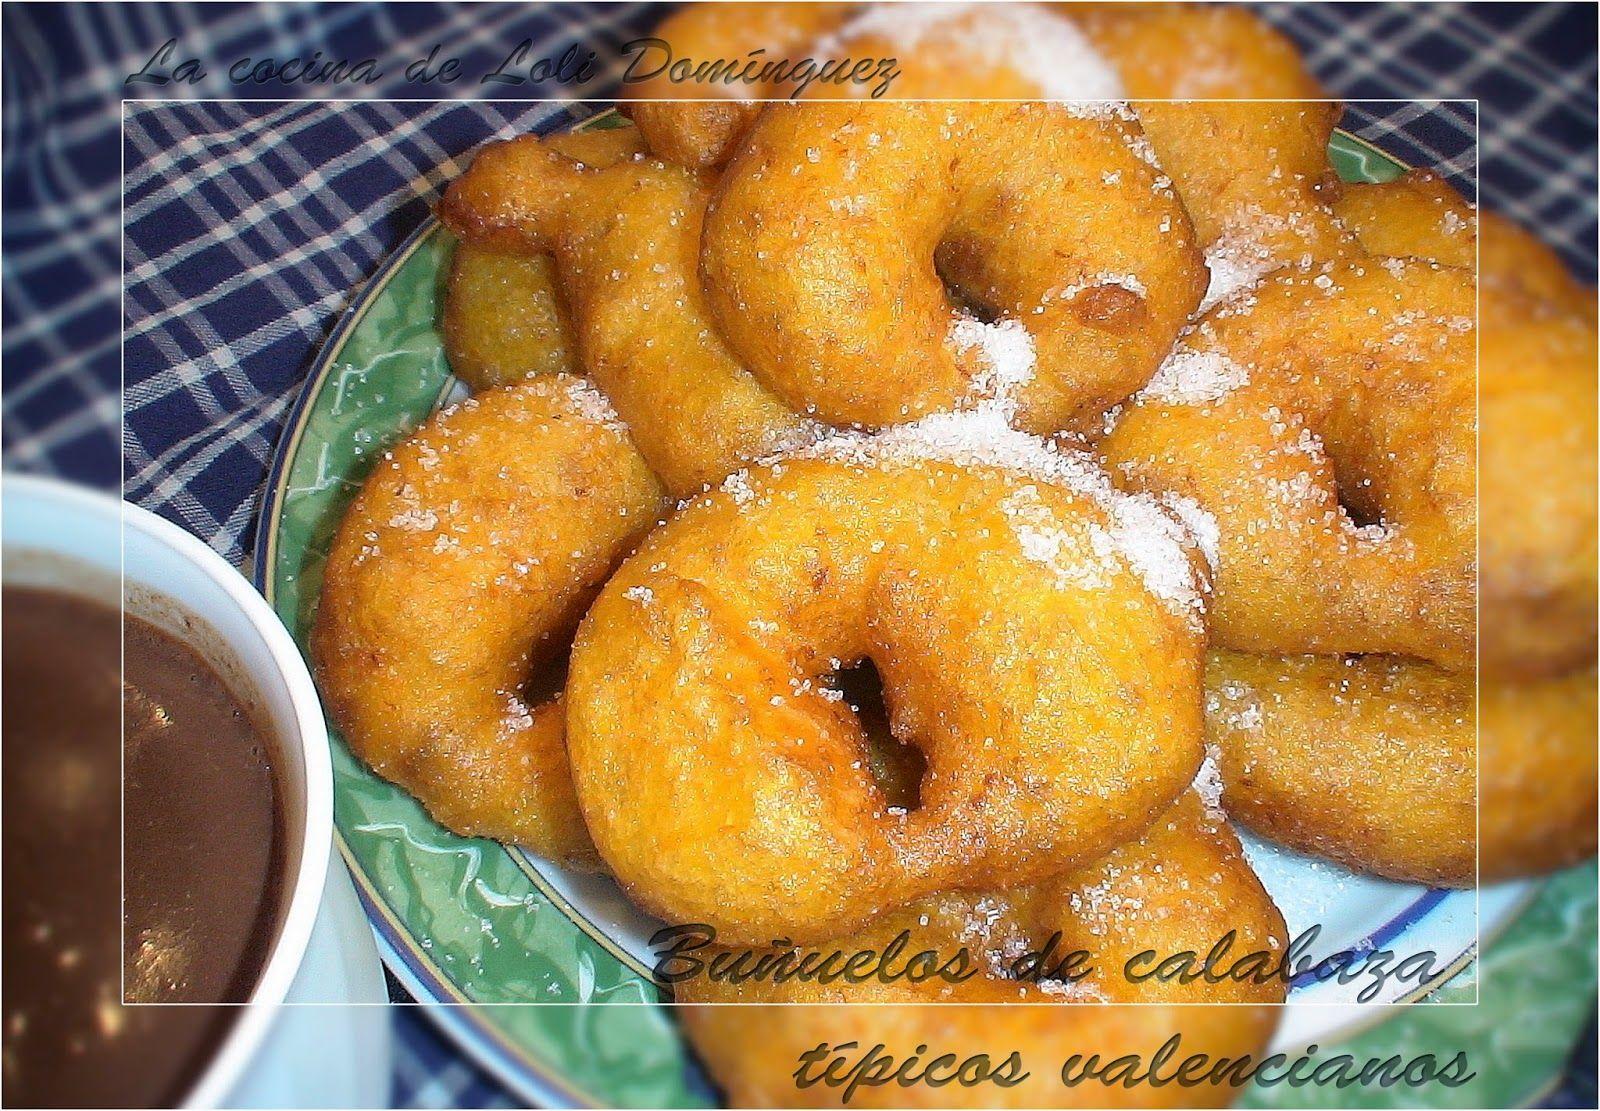 La cocina de Loli Domínguez: Dulces fritos